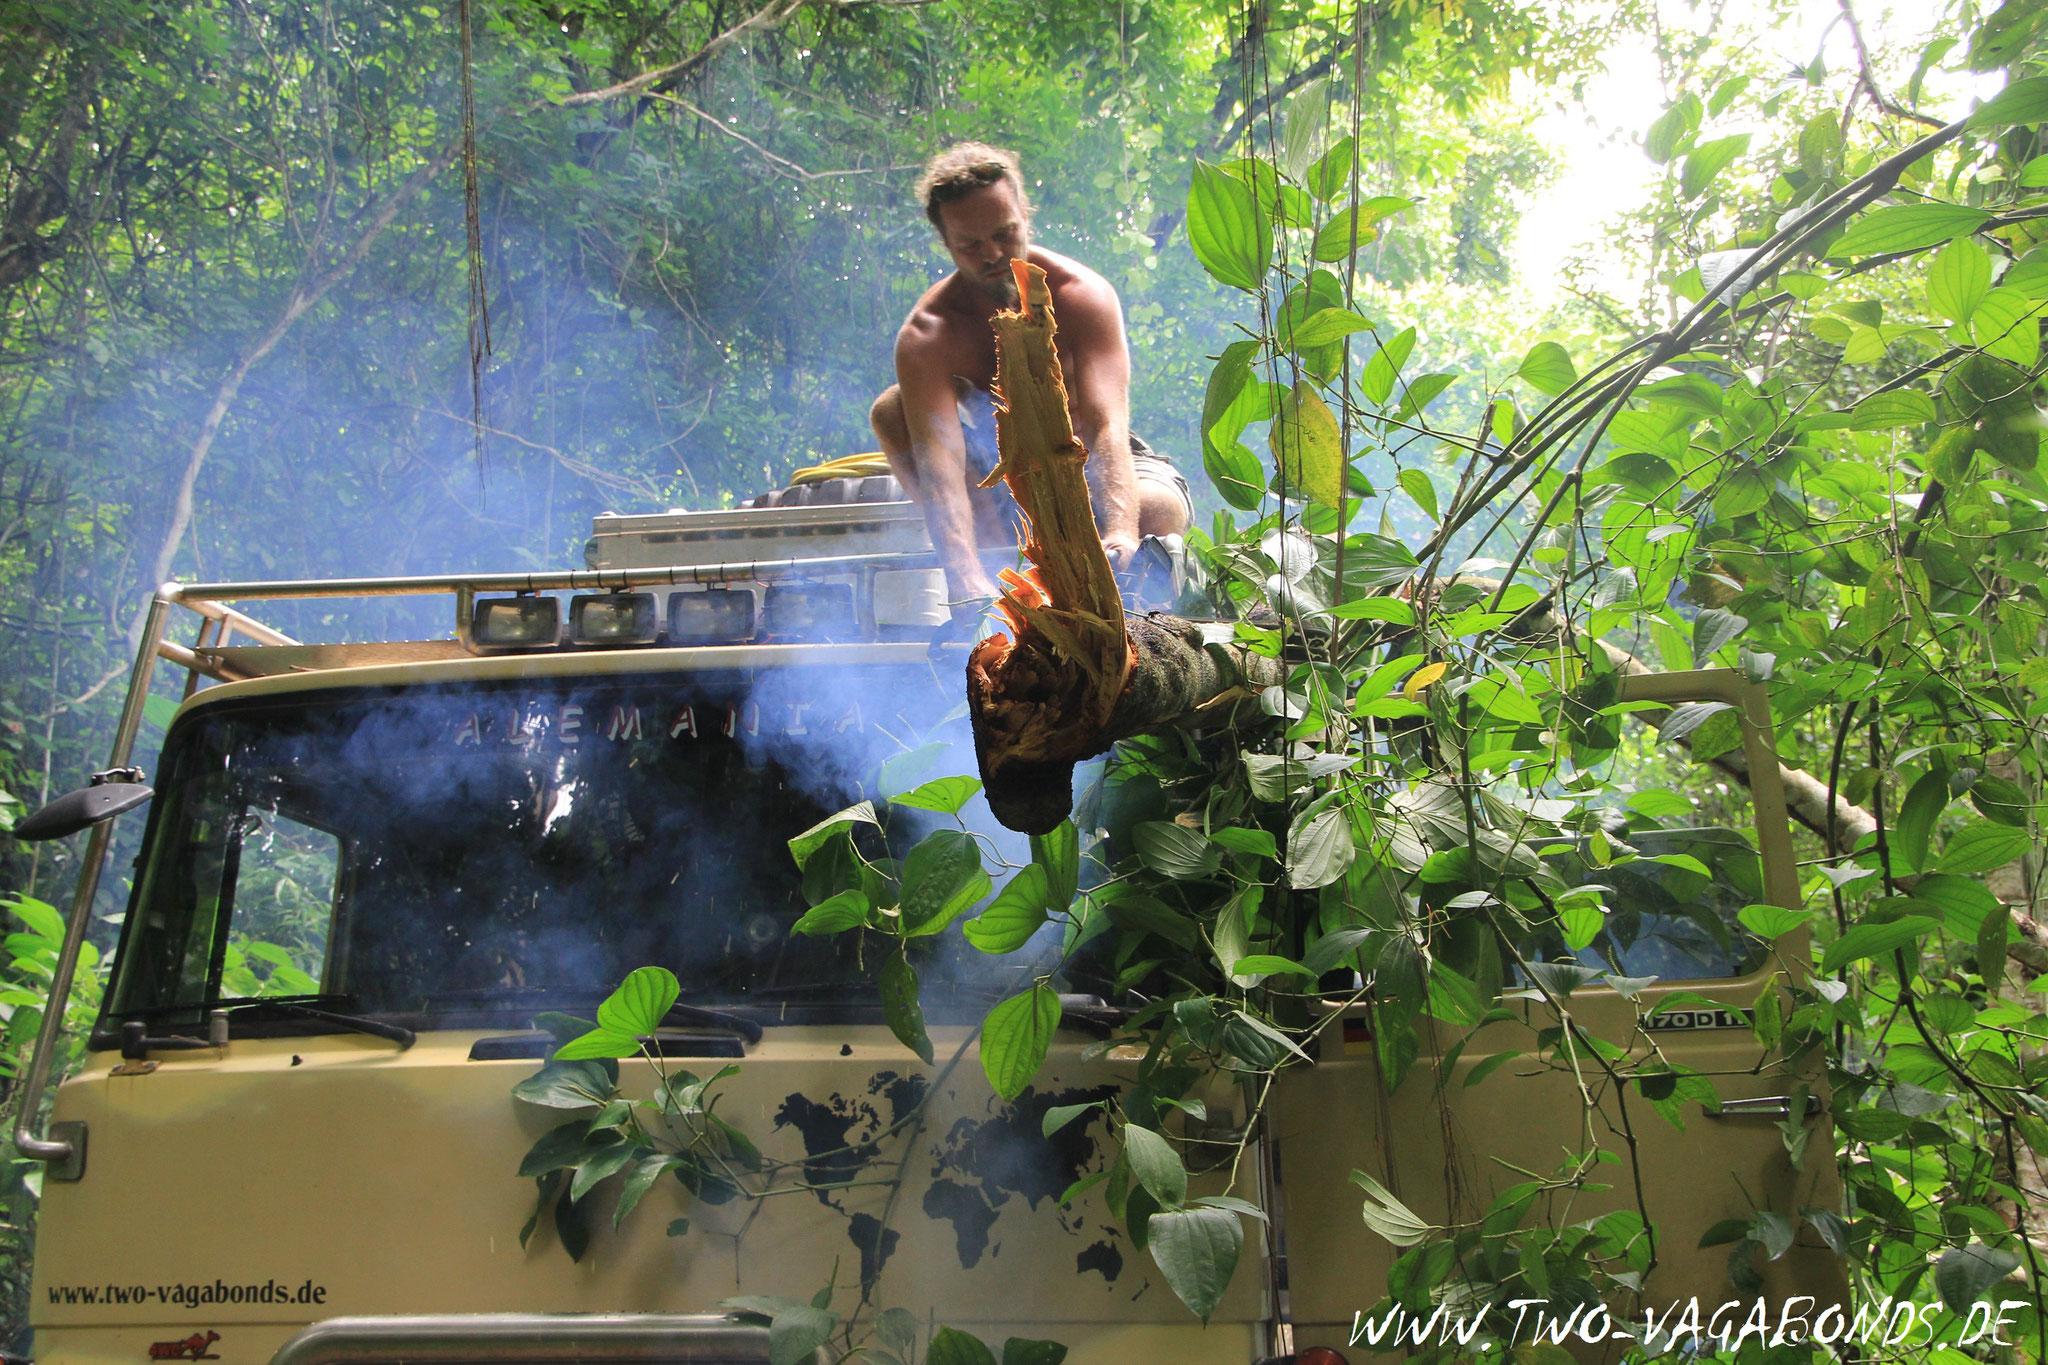 COSTA RICA 2013 - DSCHUNGEL ADEVENTURE